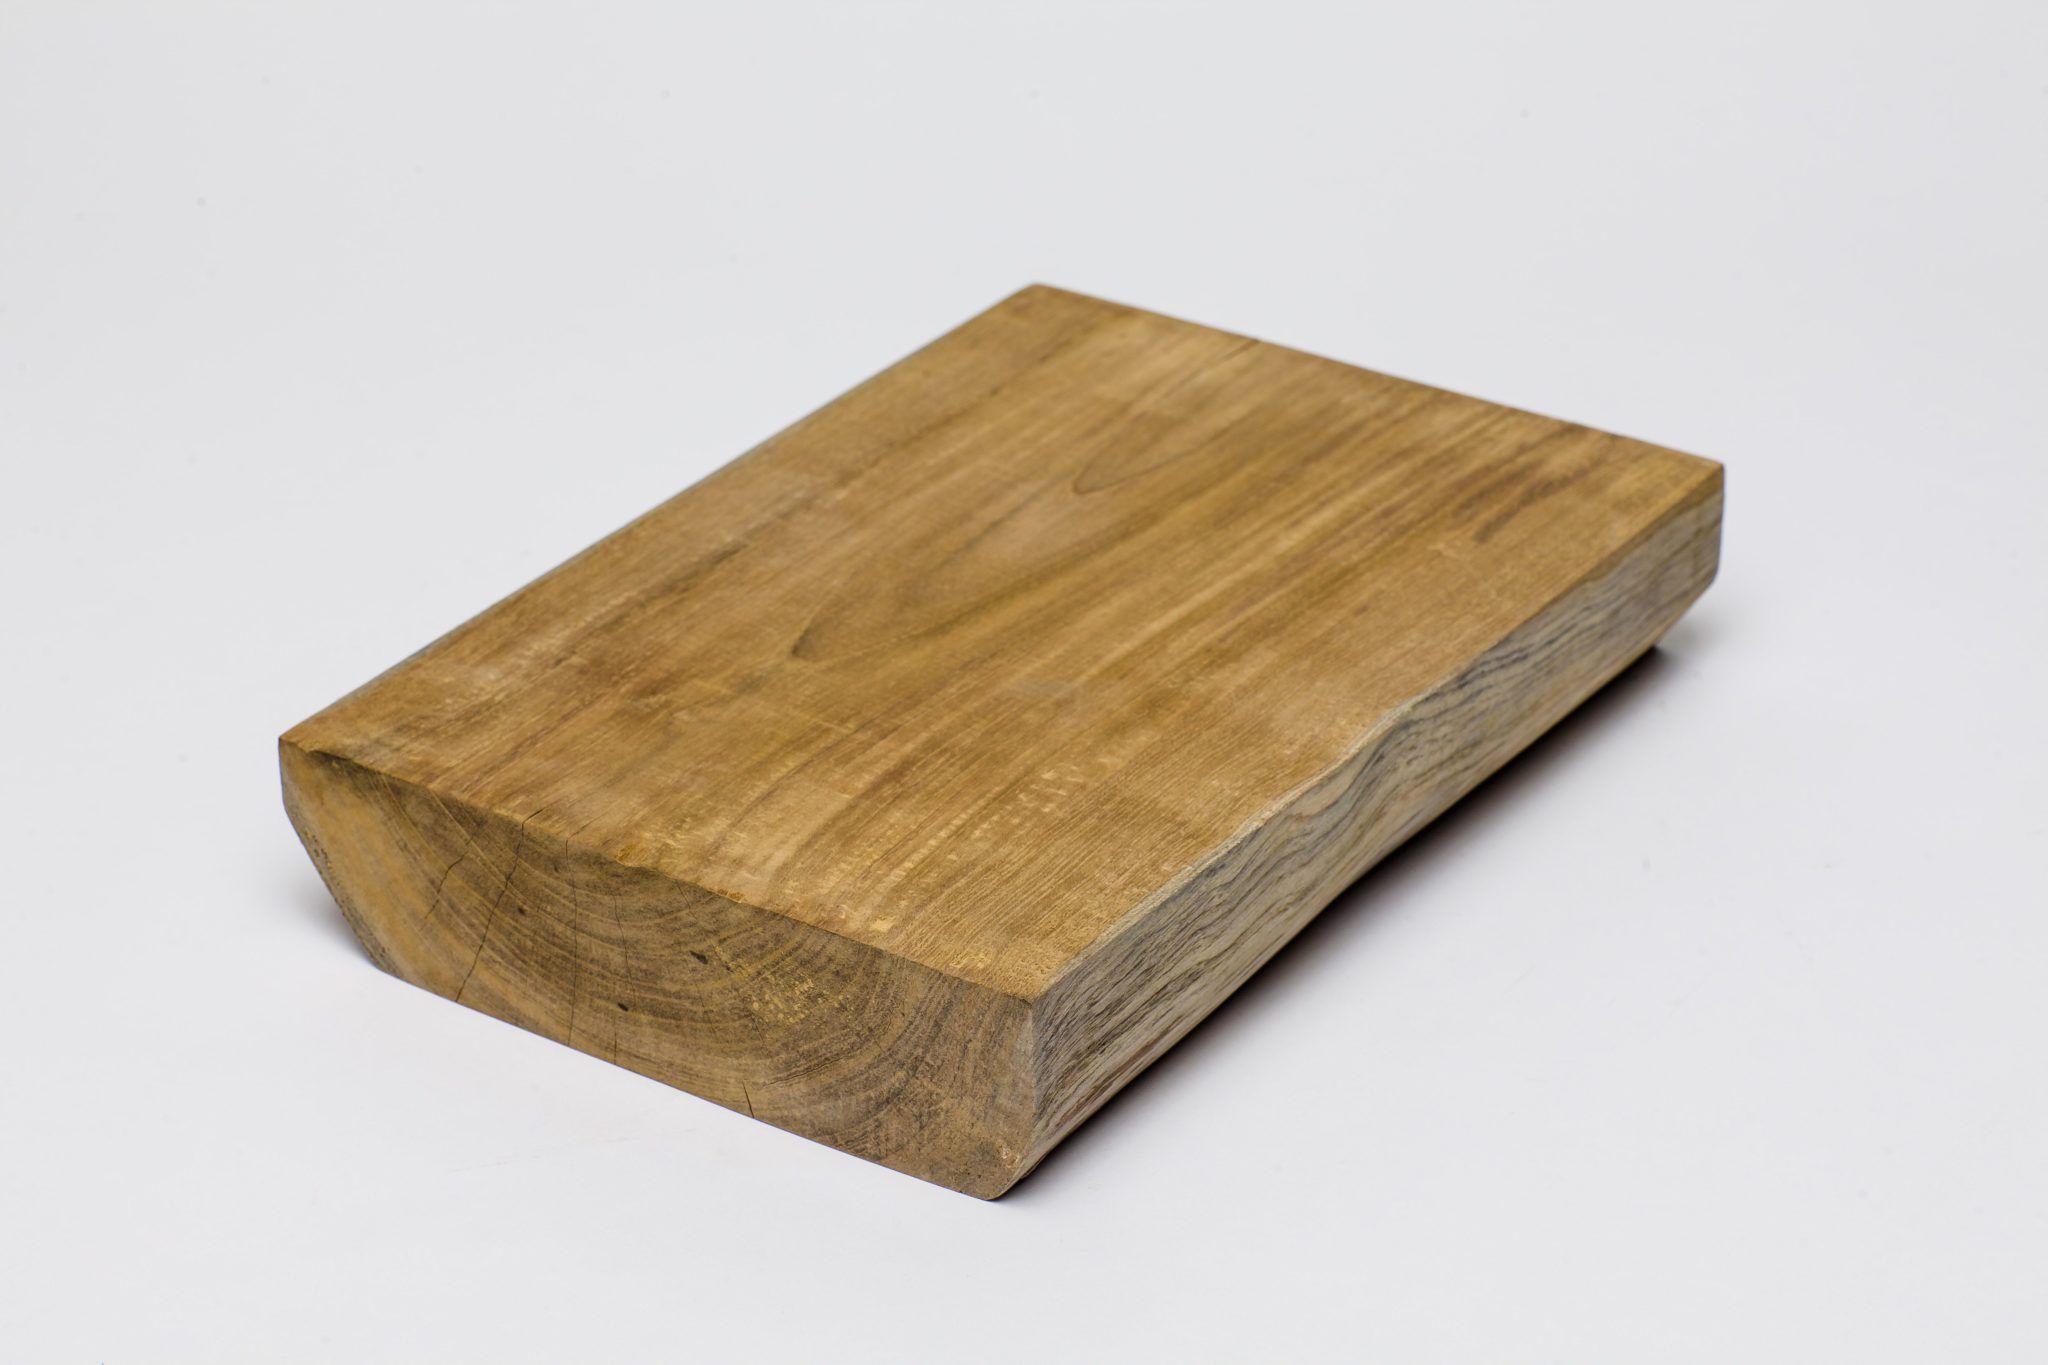 teak-root-rectangular-chopping-board-swatch